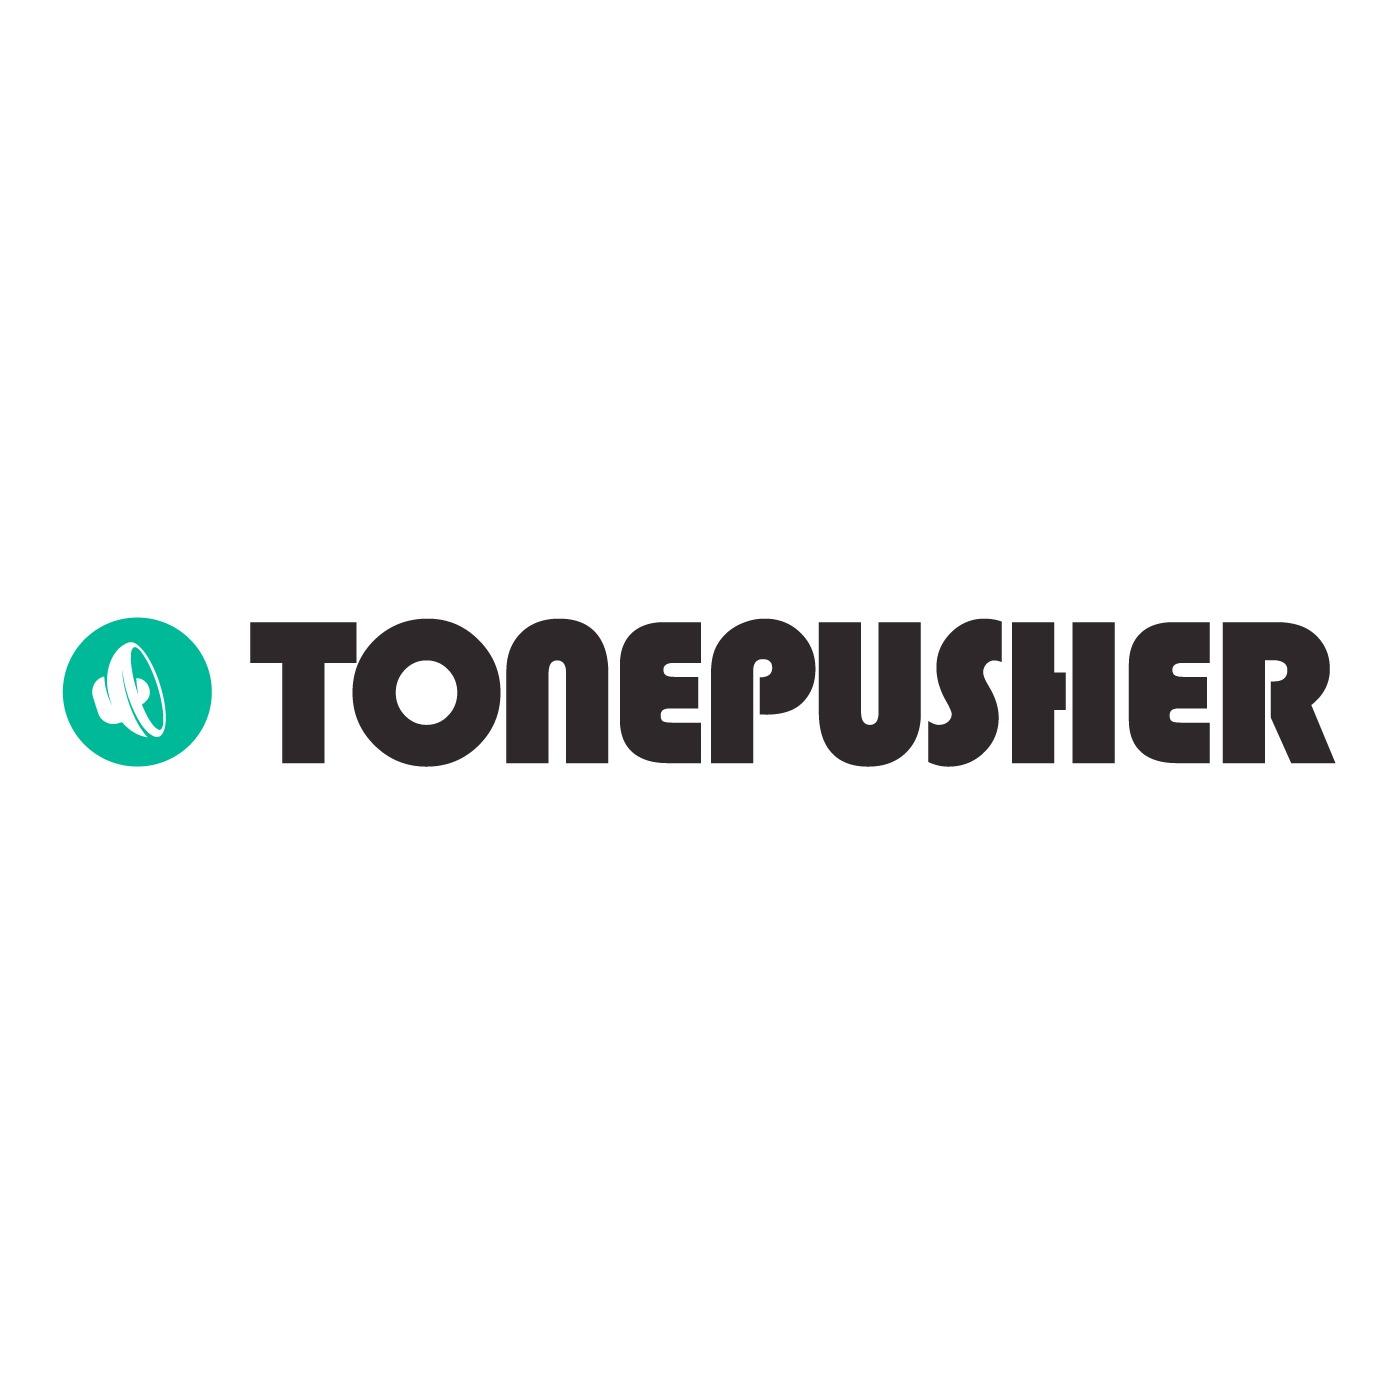 Tonepusher